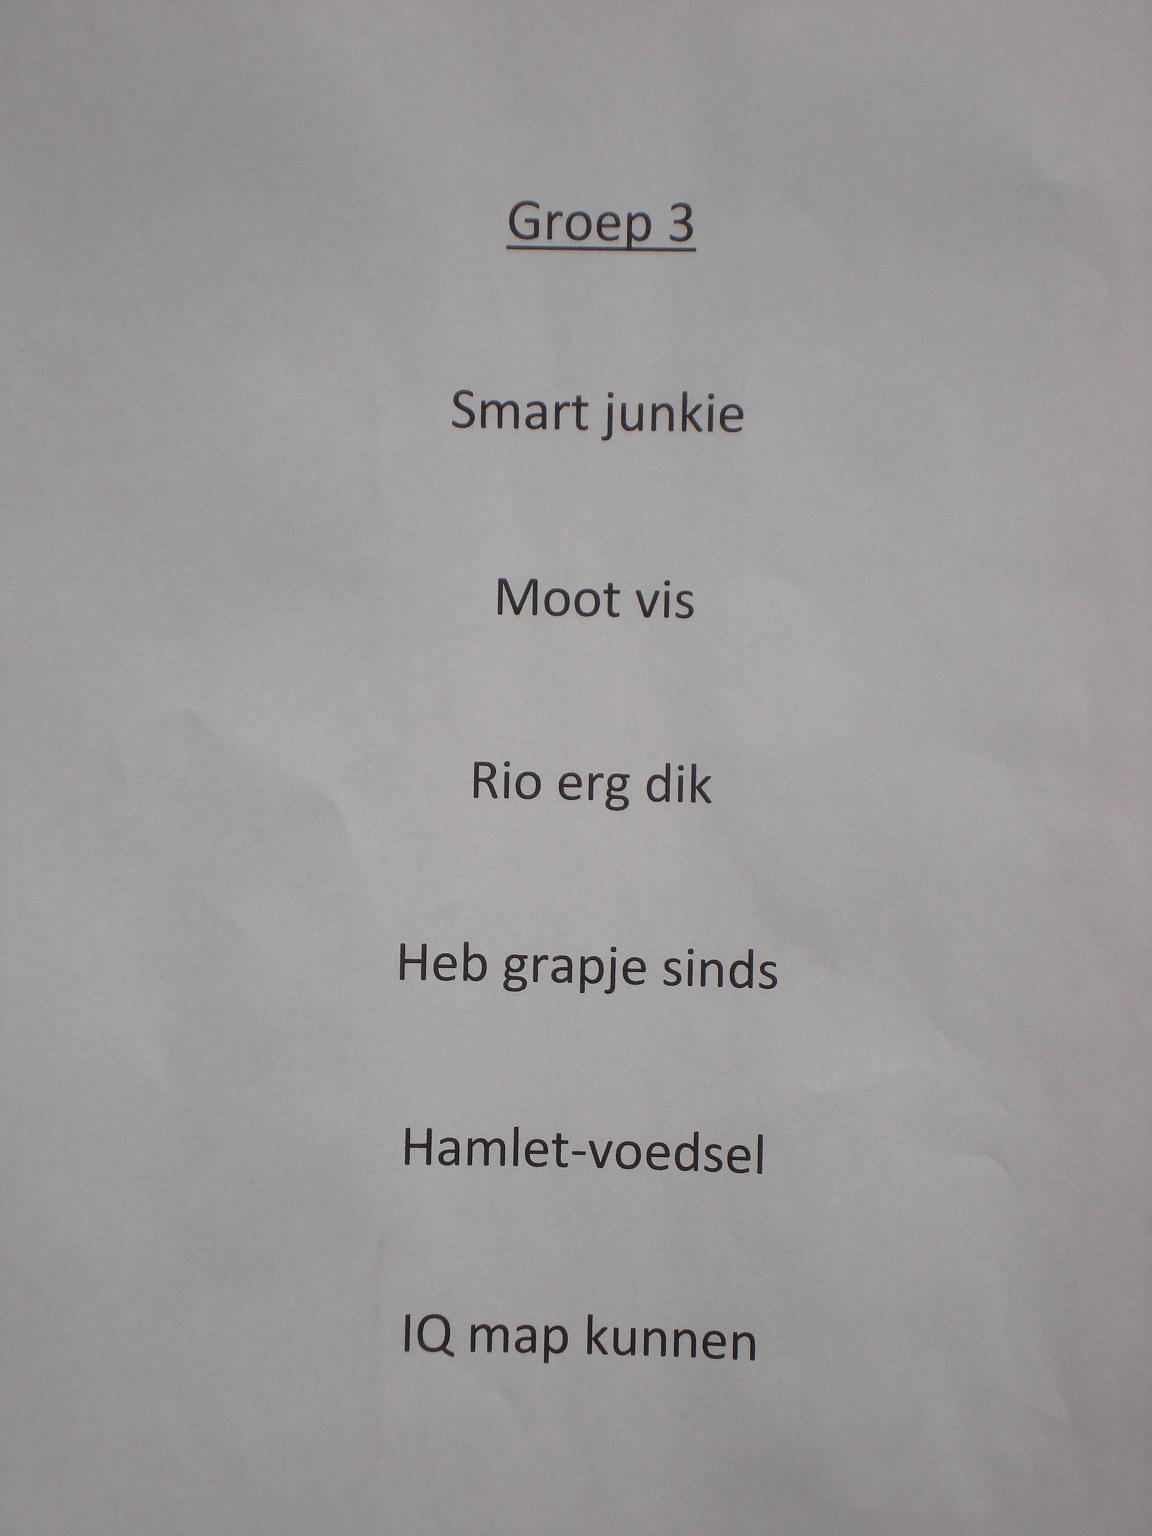 groep3